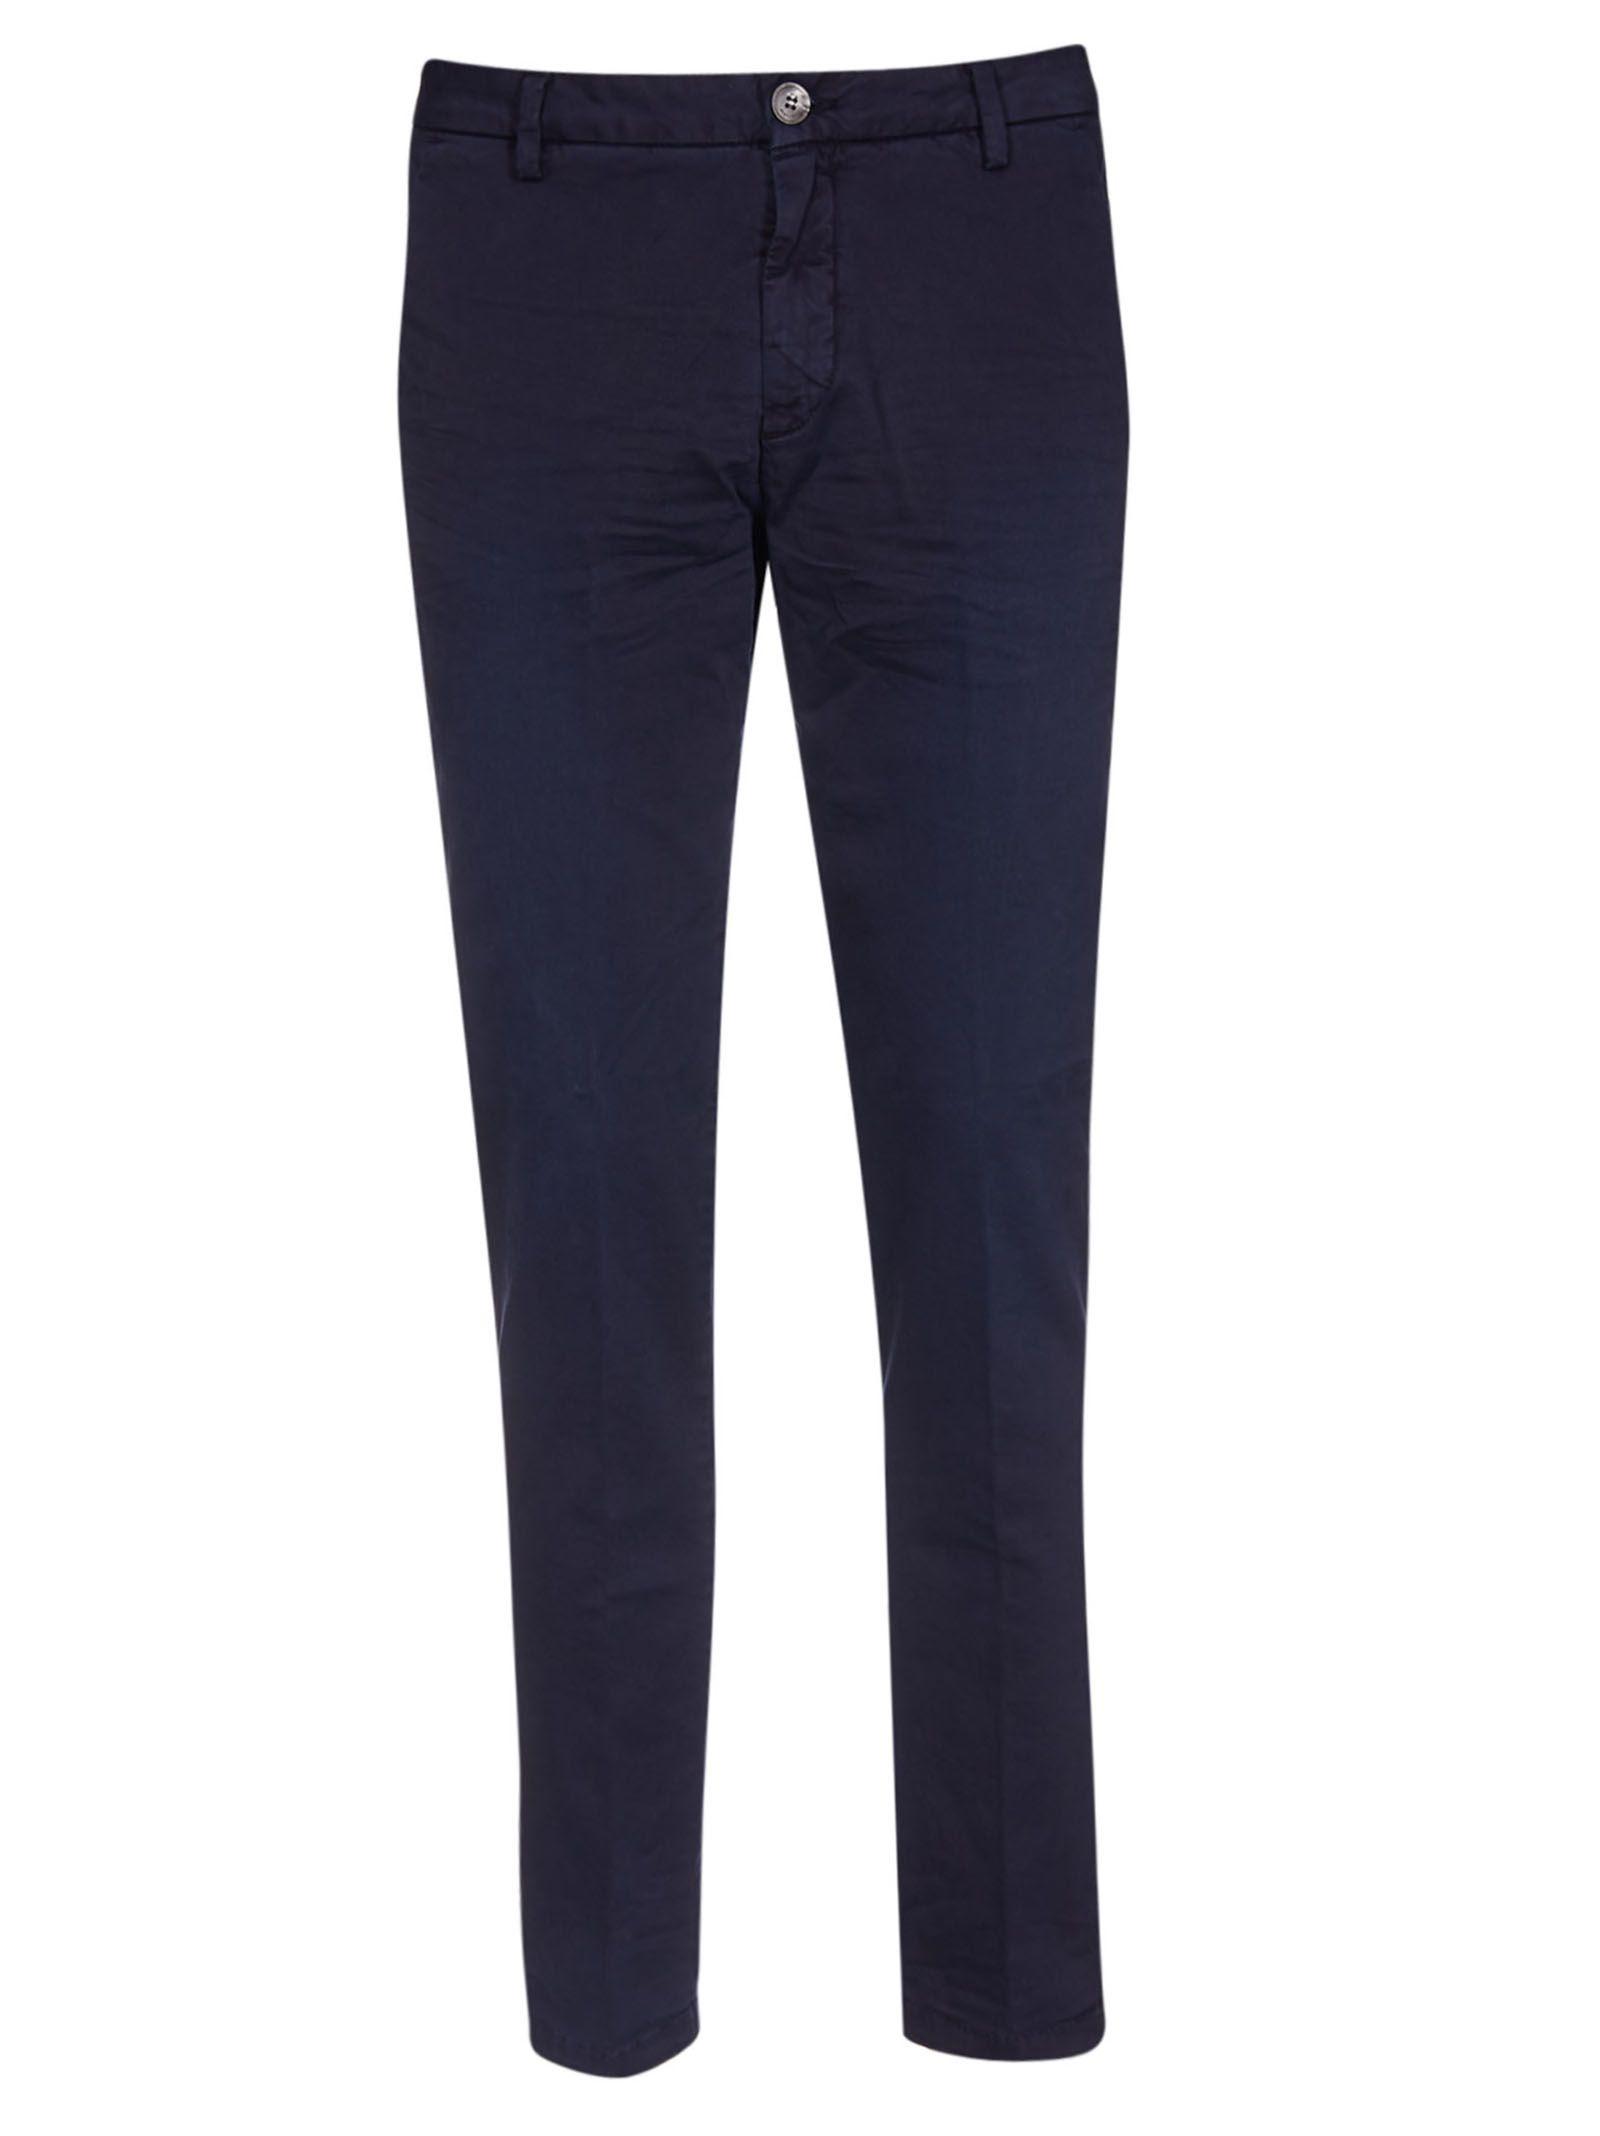 AGLINI Edgard Trousers in Blue